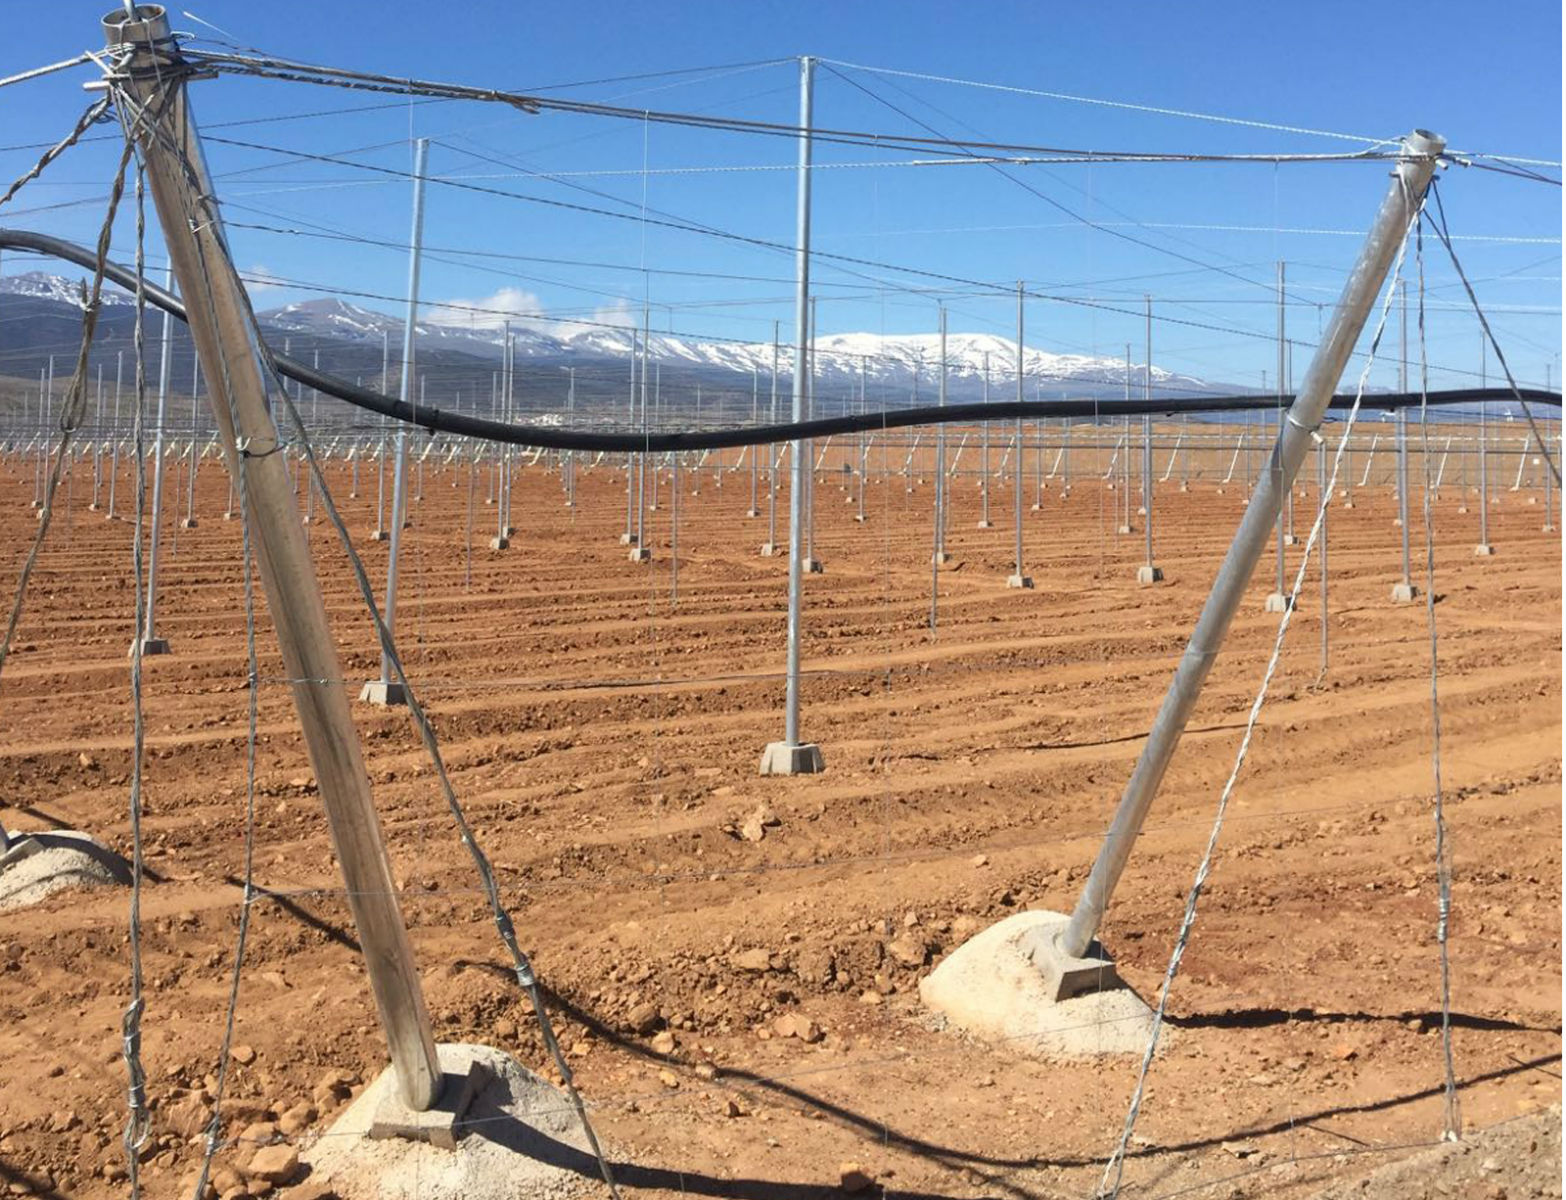 Proyecto-Agroclean-Invernaderos-Malla-Sombra-03